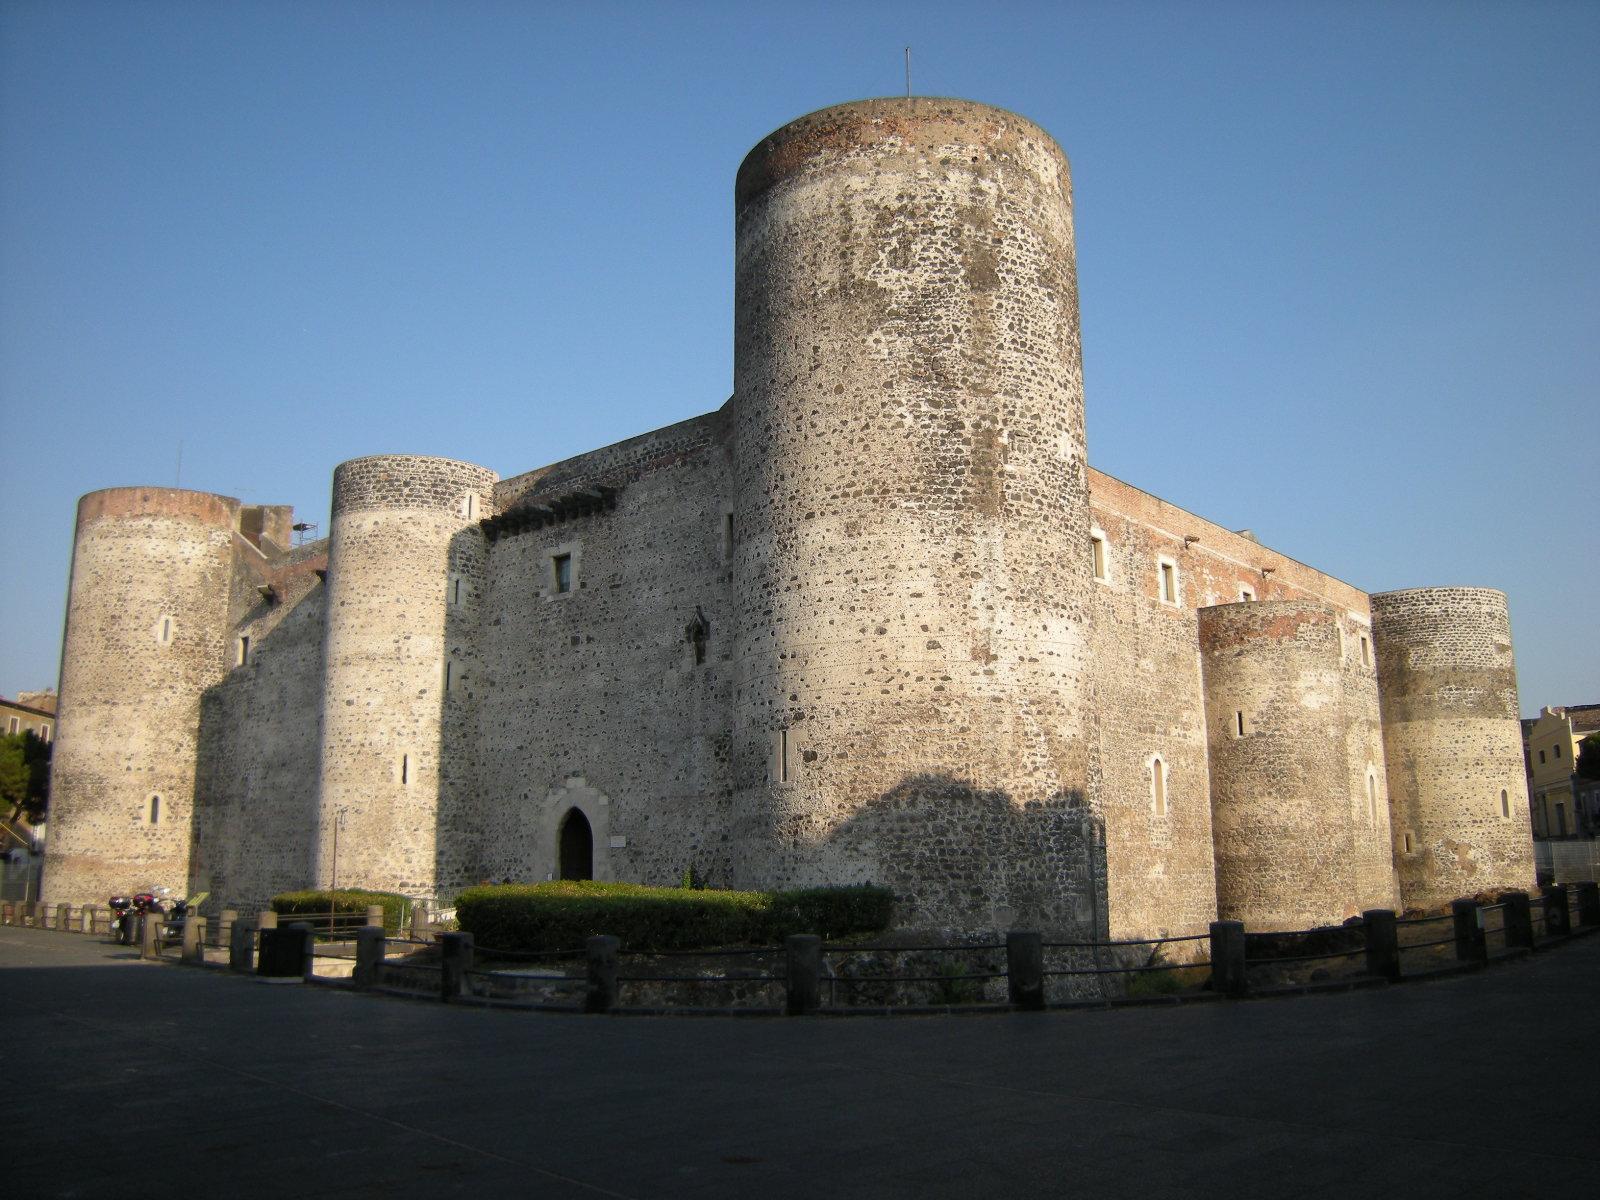 File:Castello Ursino (2761235338).jpg - Wikimedia Commons